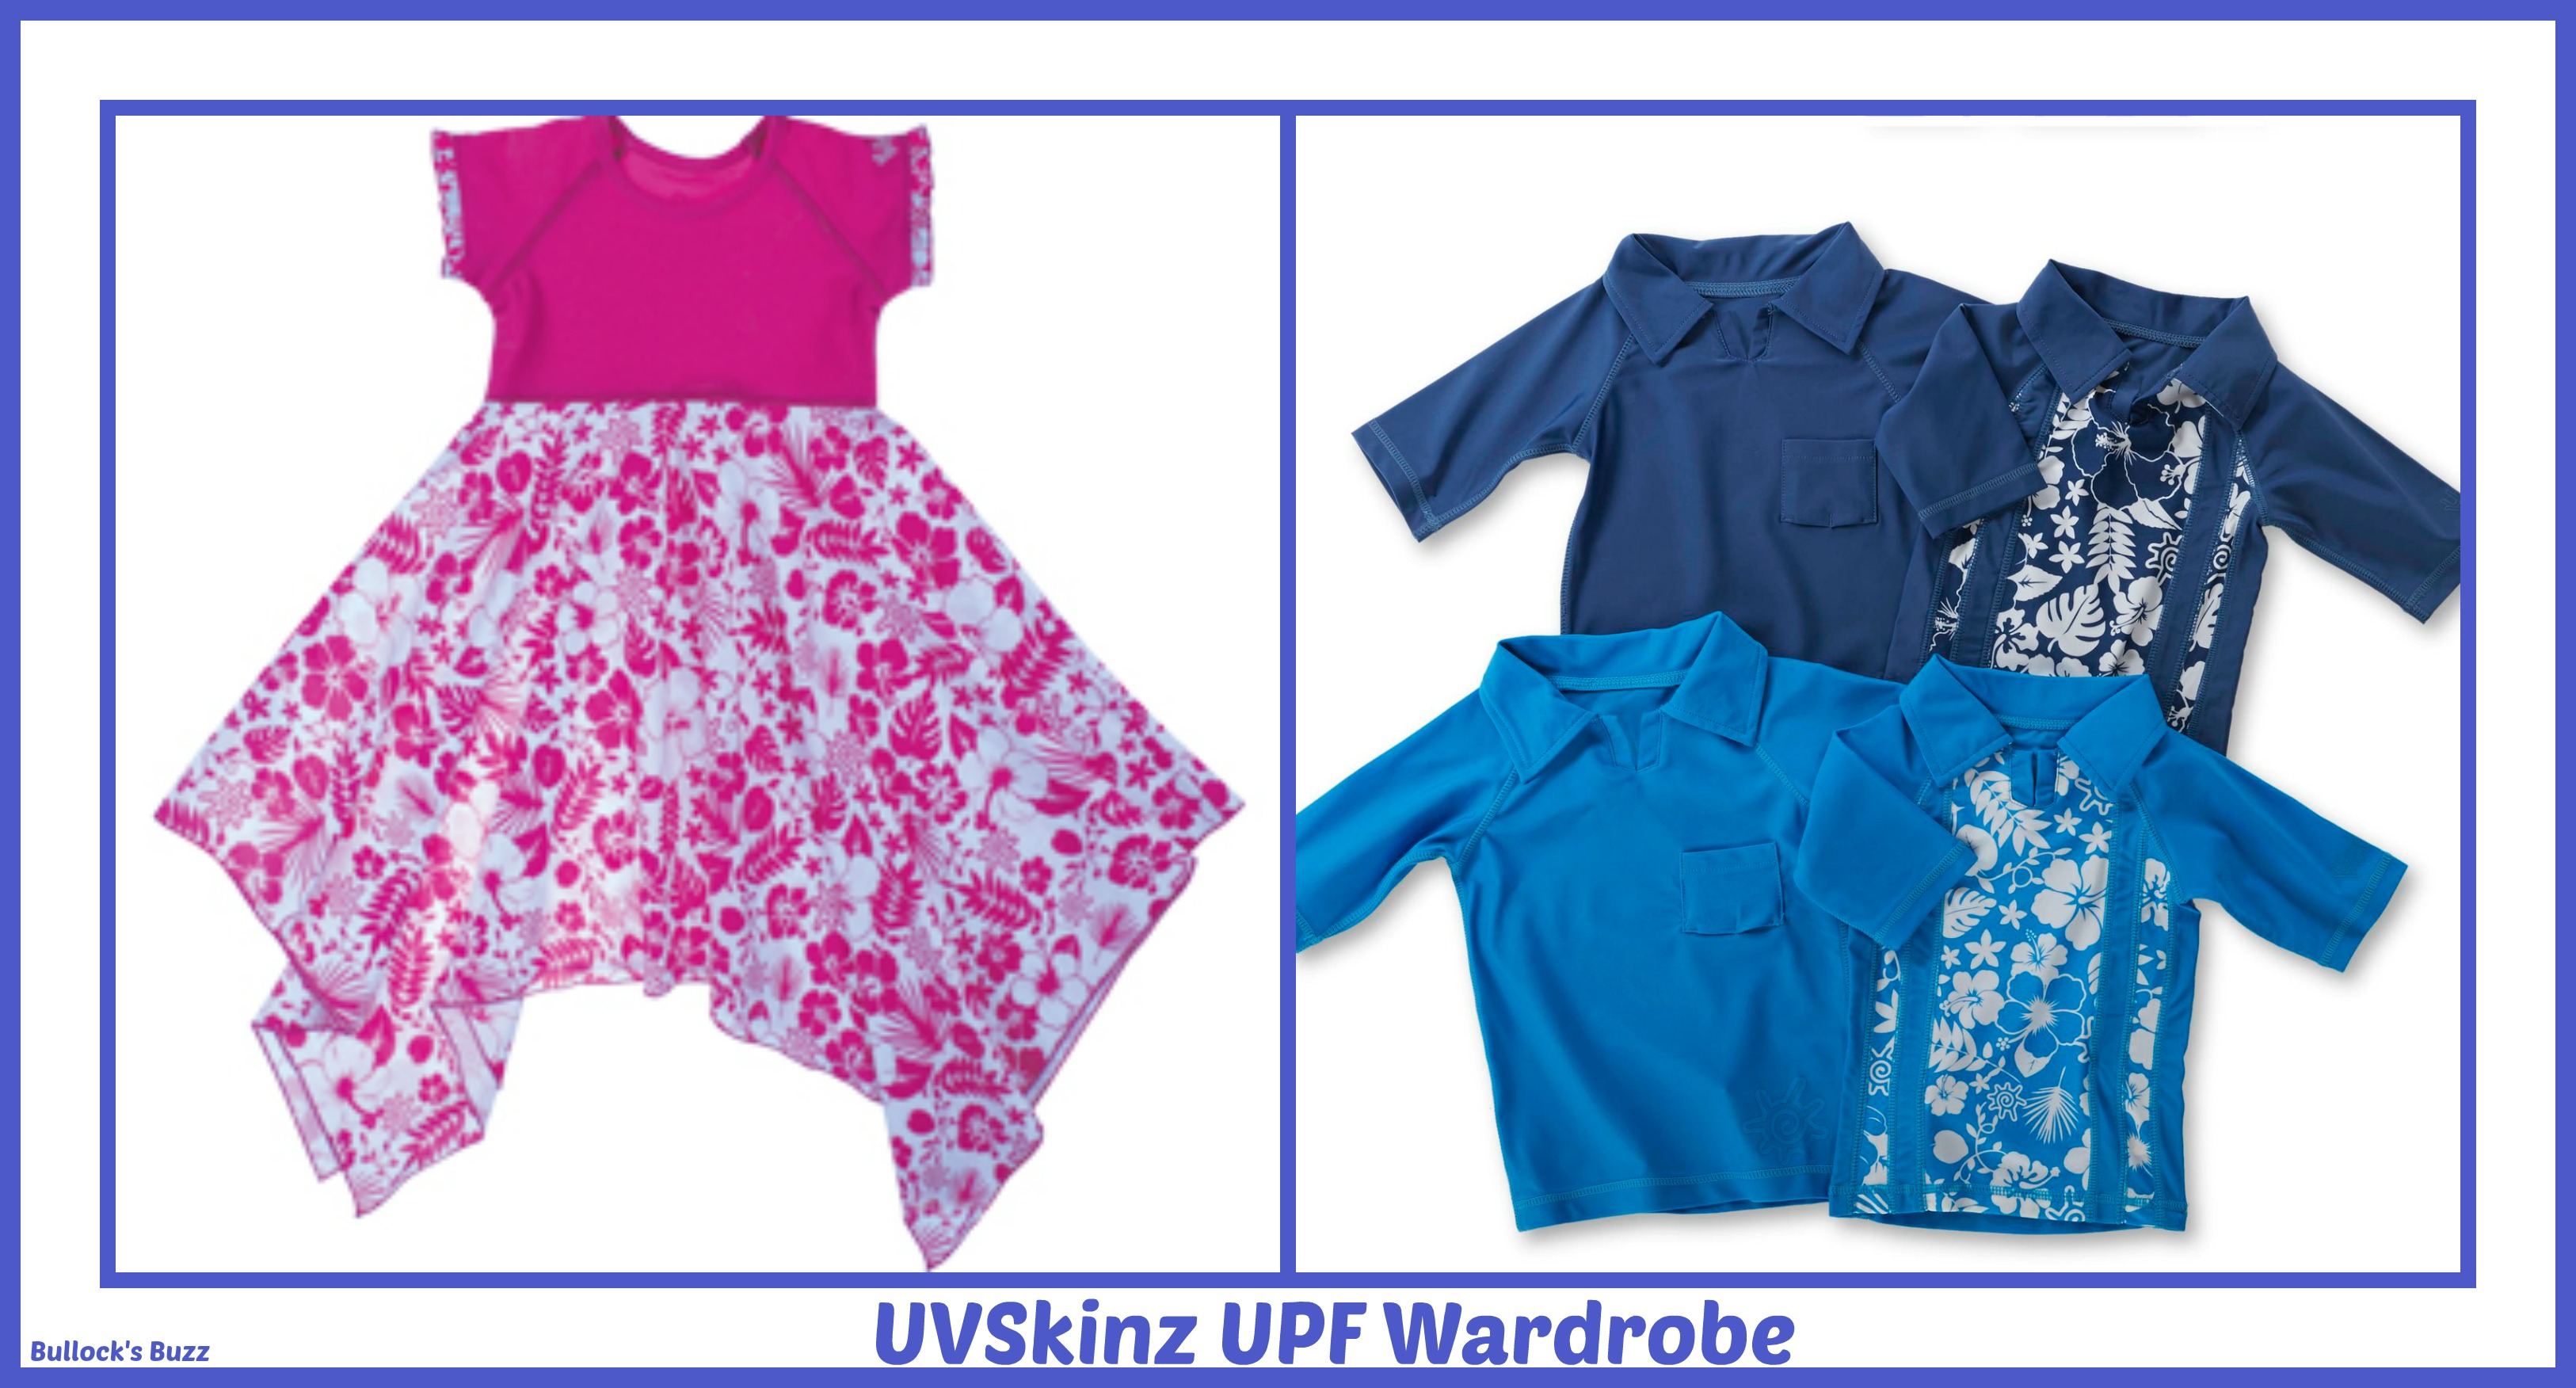 Catenya Smart Sun Travel Style Solutions UVSkinz UPF Wardrobe